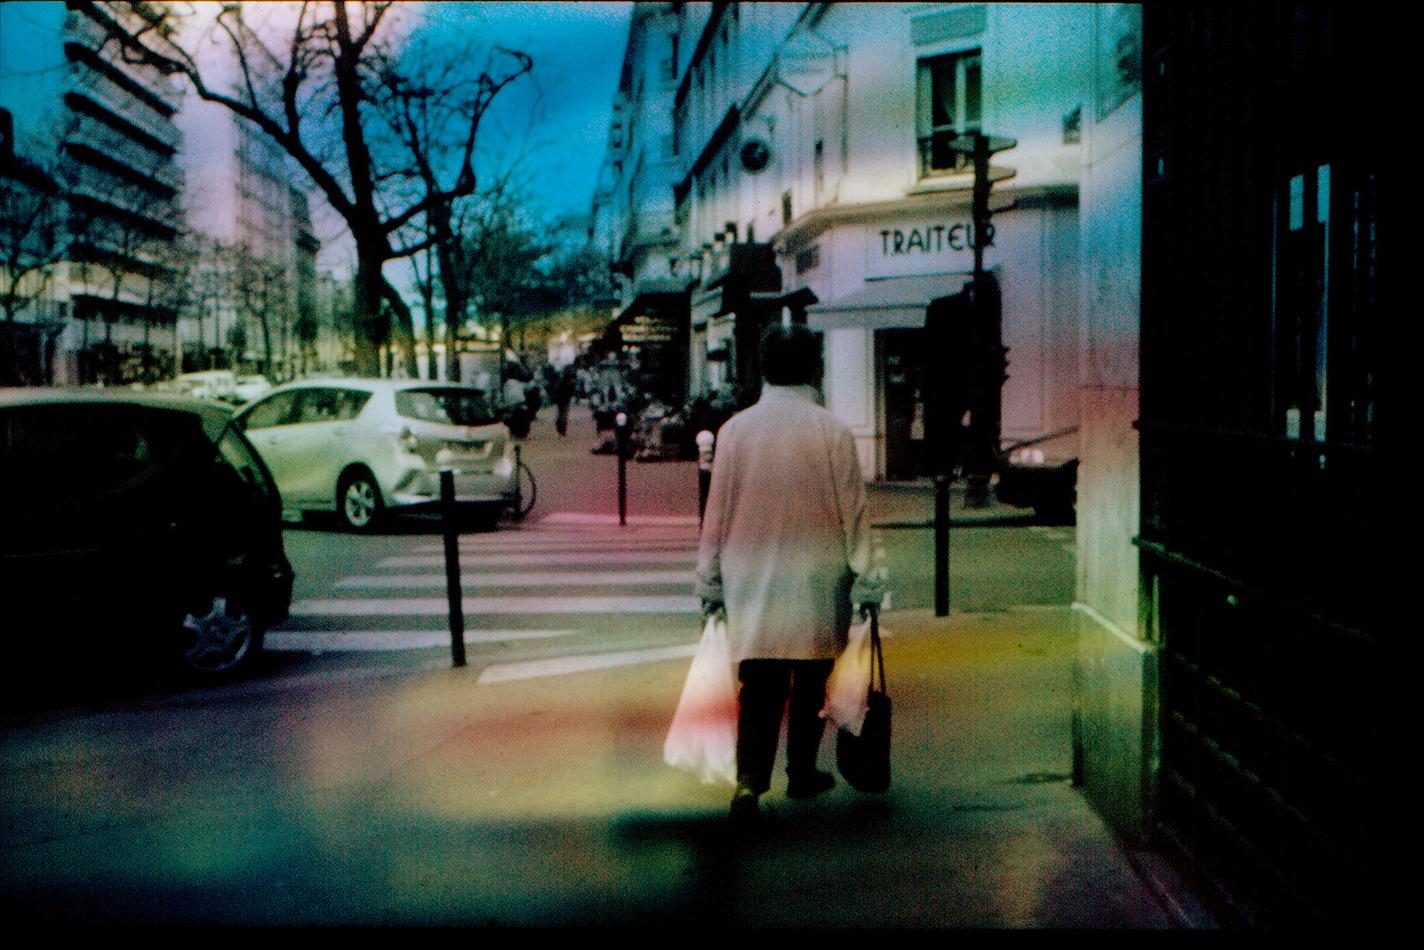 http://fred.chapotat.free.fr/indexhibitv070e/files/gimgs/152_ekta-souviens-toi-116.jpg